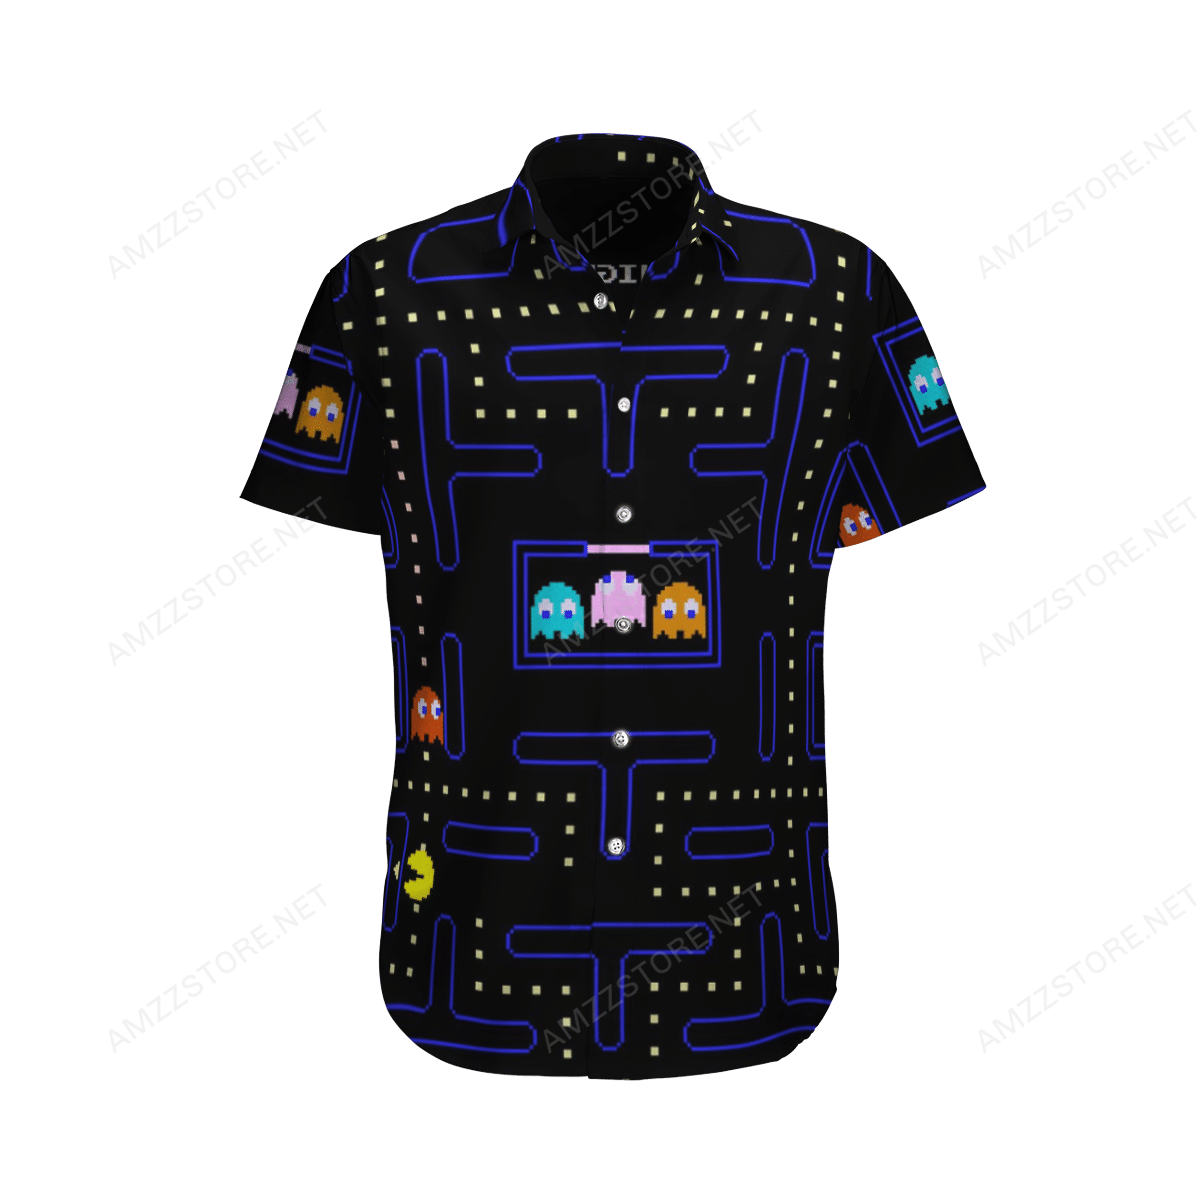 Pac-man Video game Hawaiian Shirt